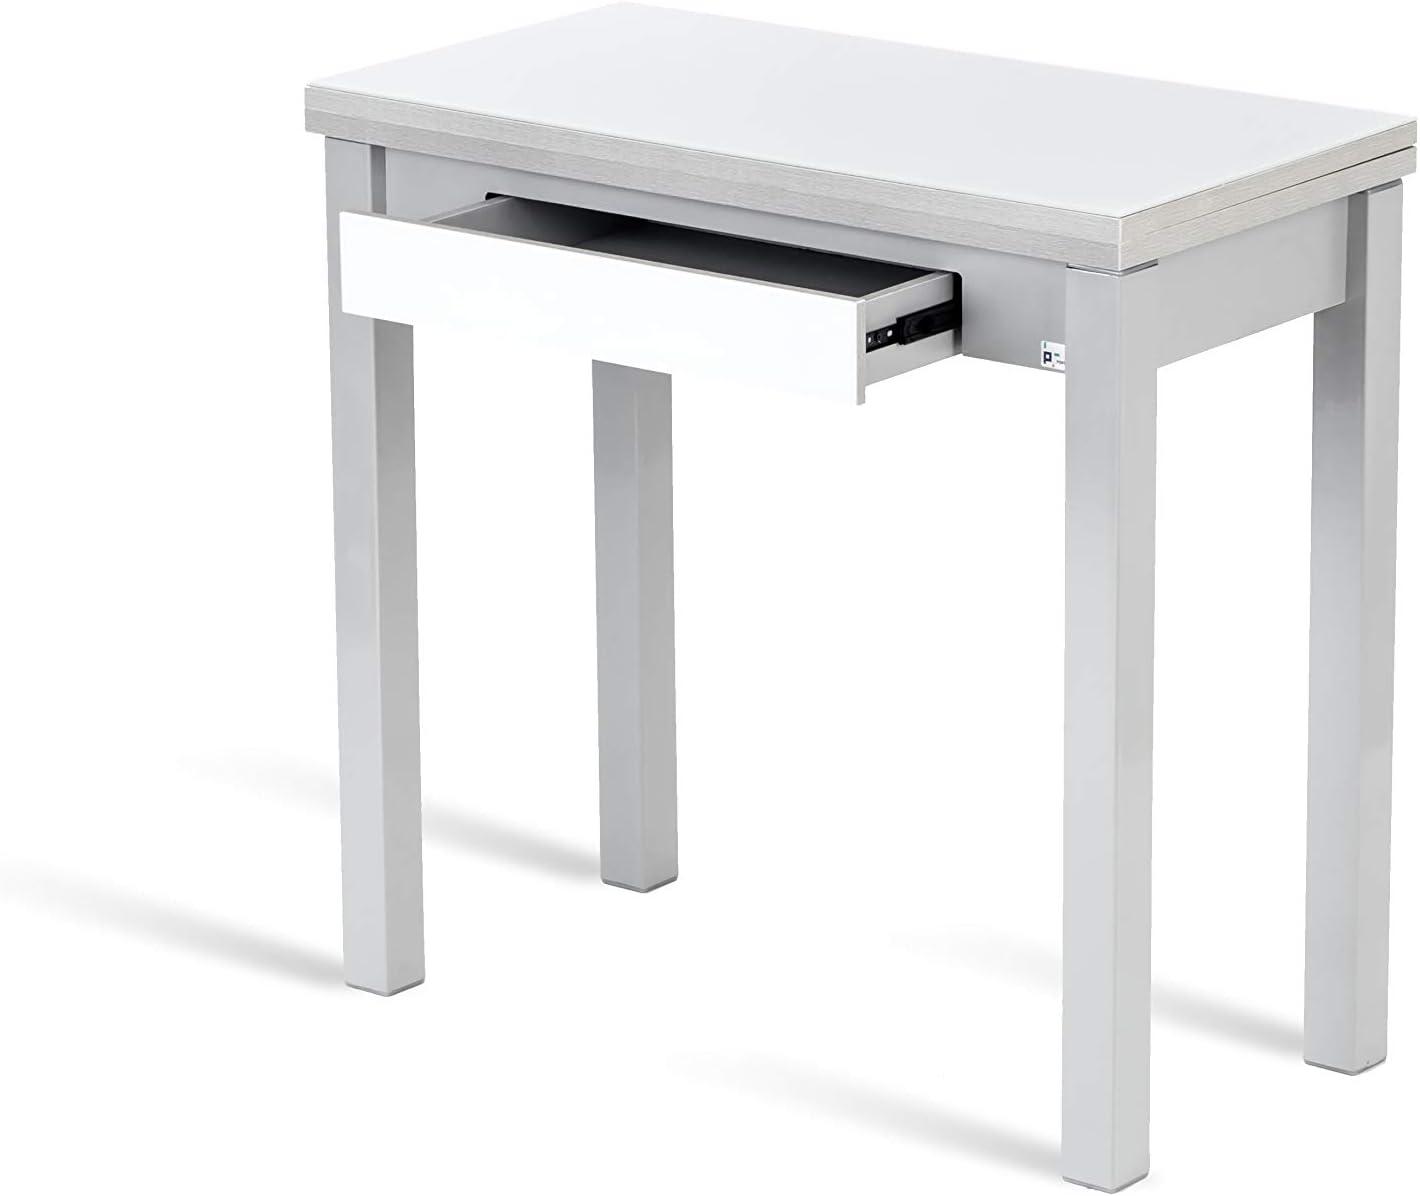 Portus Conjunto Romero - 1 Mesa Libro 80x40(80) (Cristal Blanco) + ...